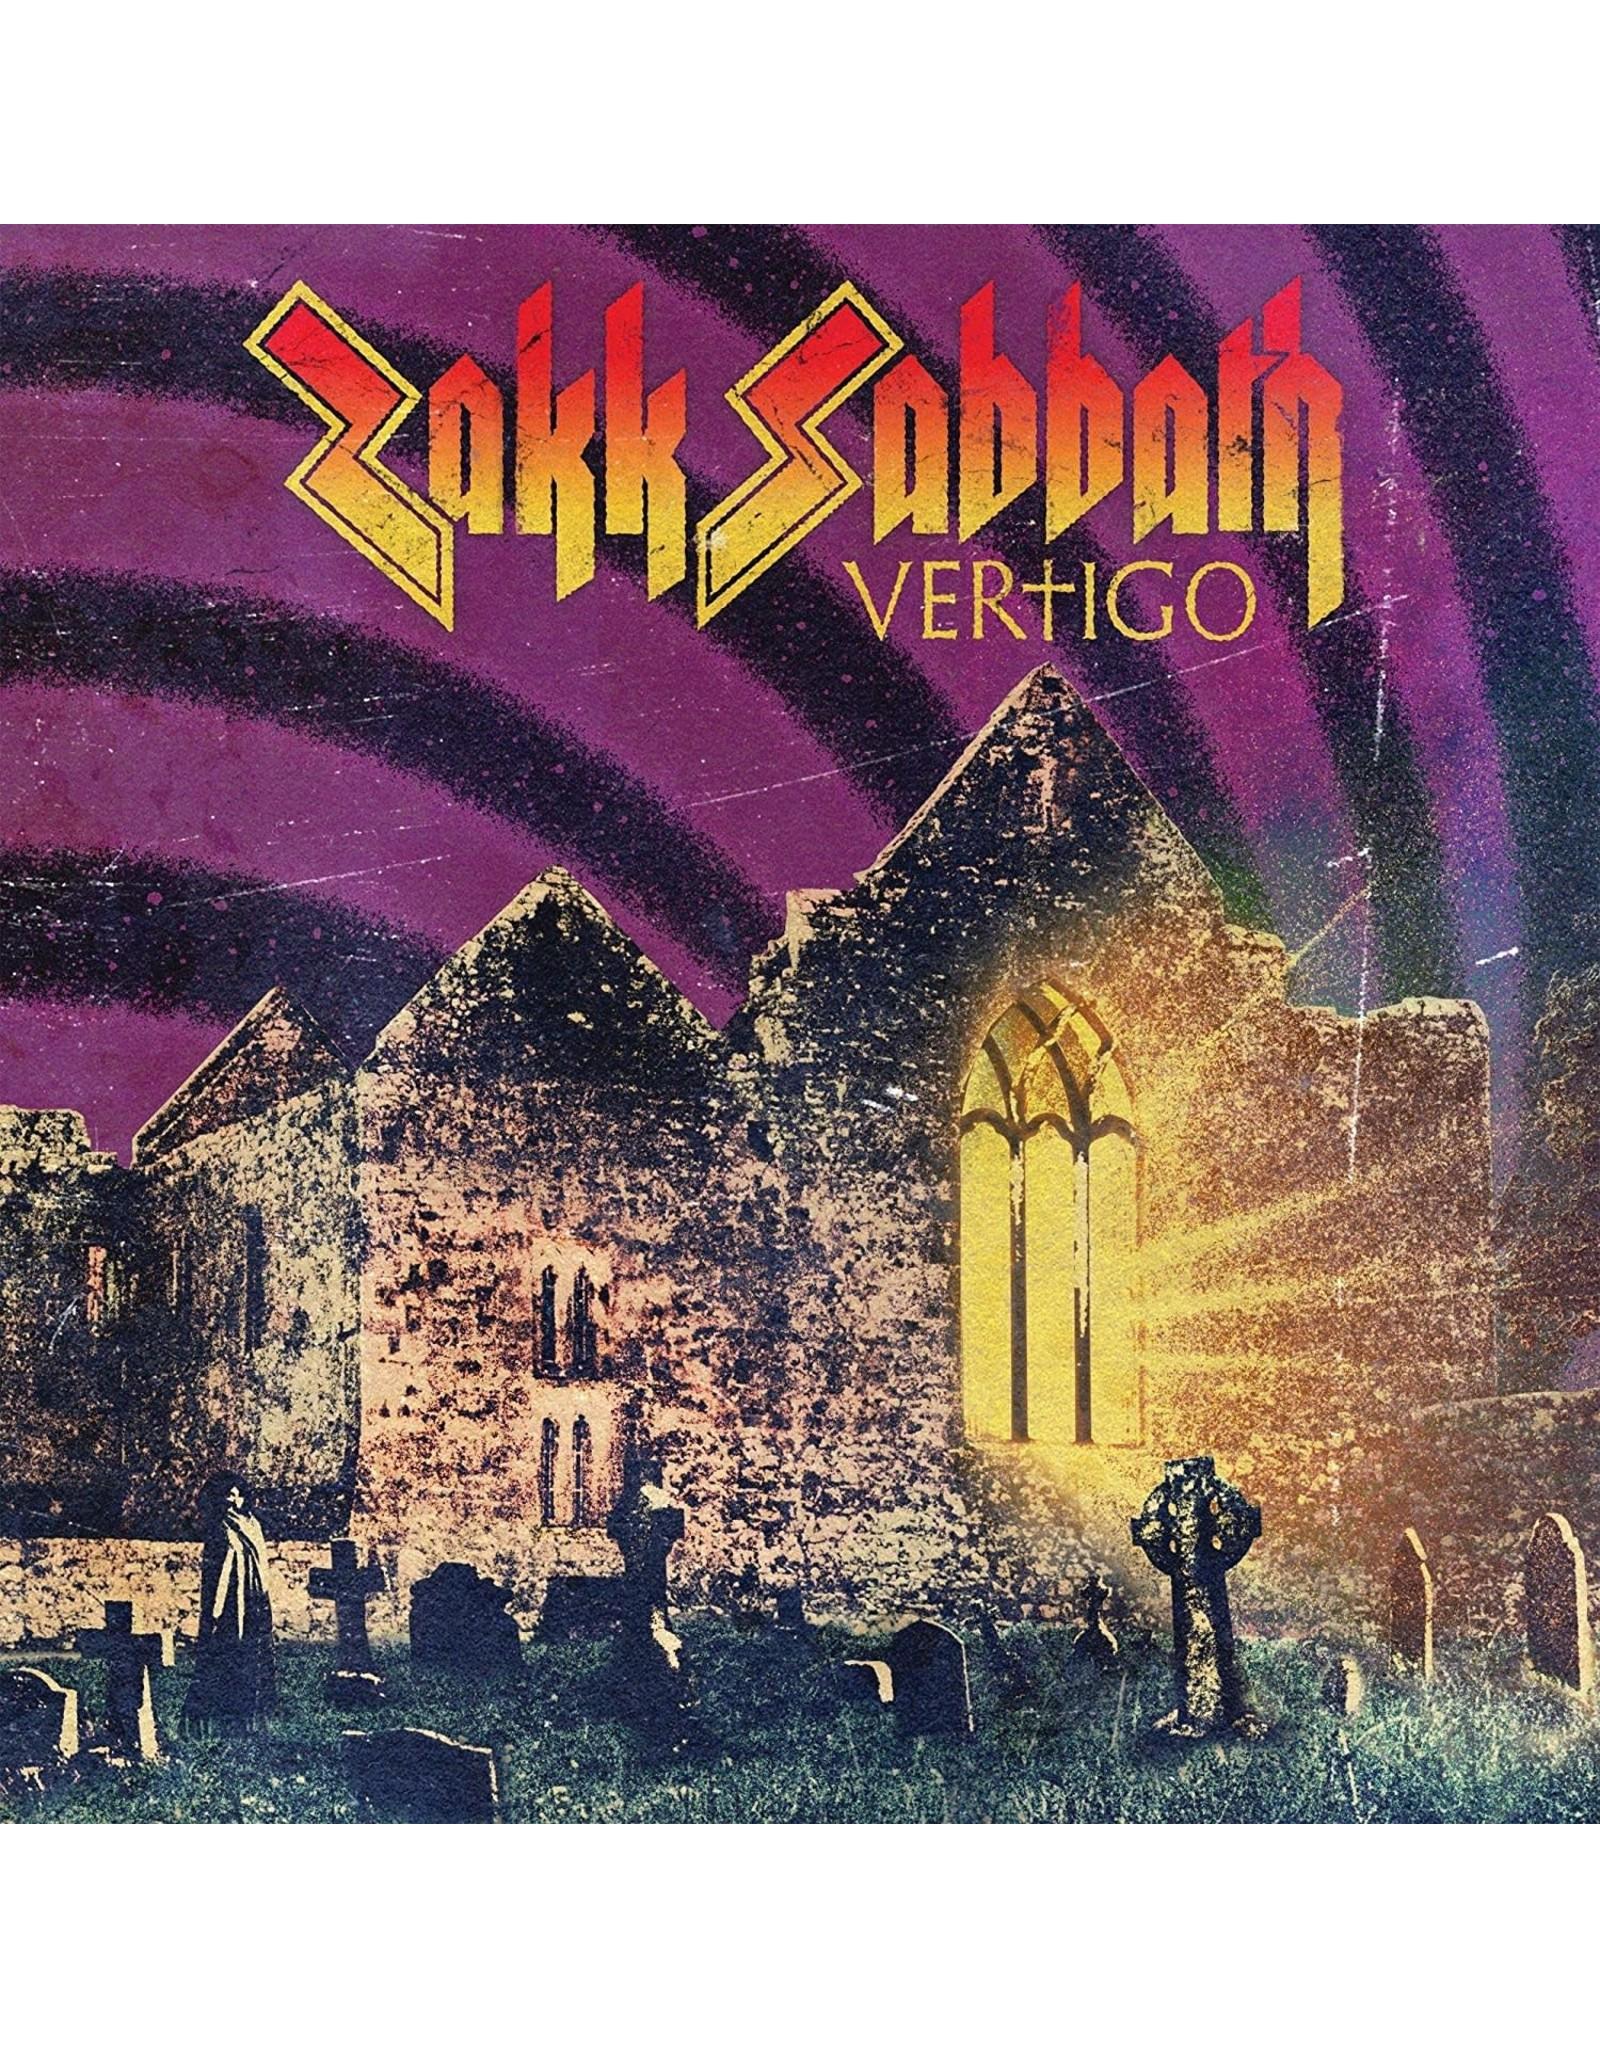 Zakk Sabbath - Vertigo LP (Purple Vinyl)